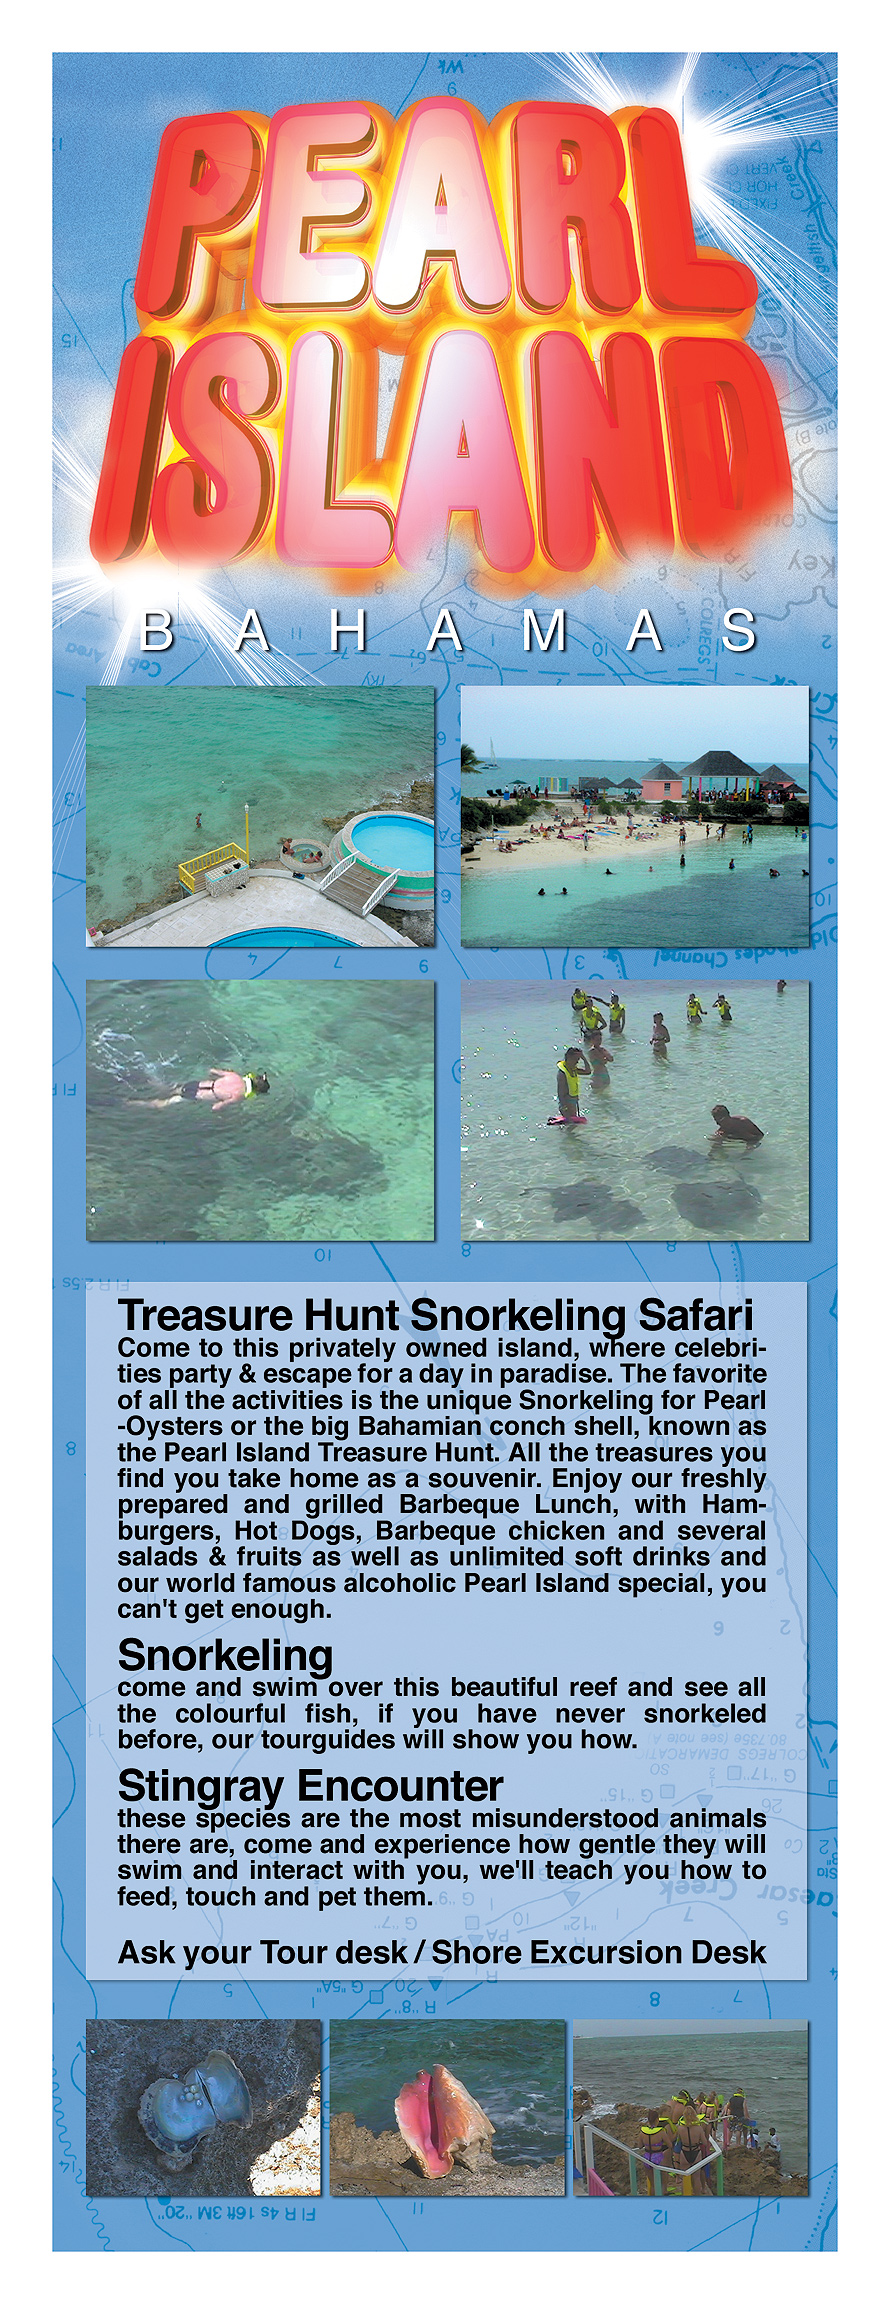 Treasure Hunt Snorkeling